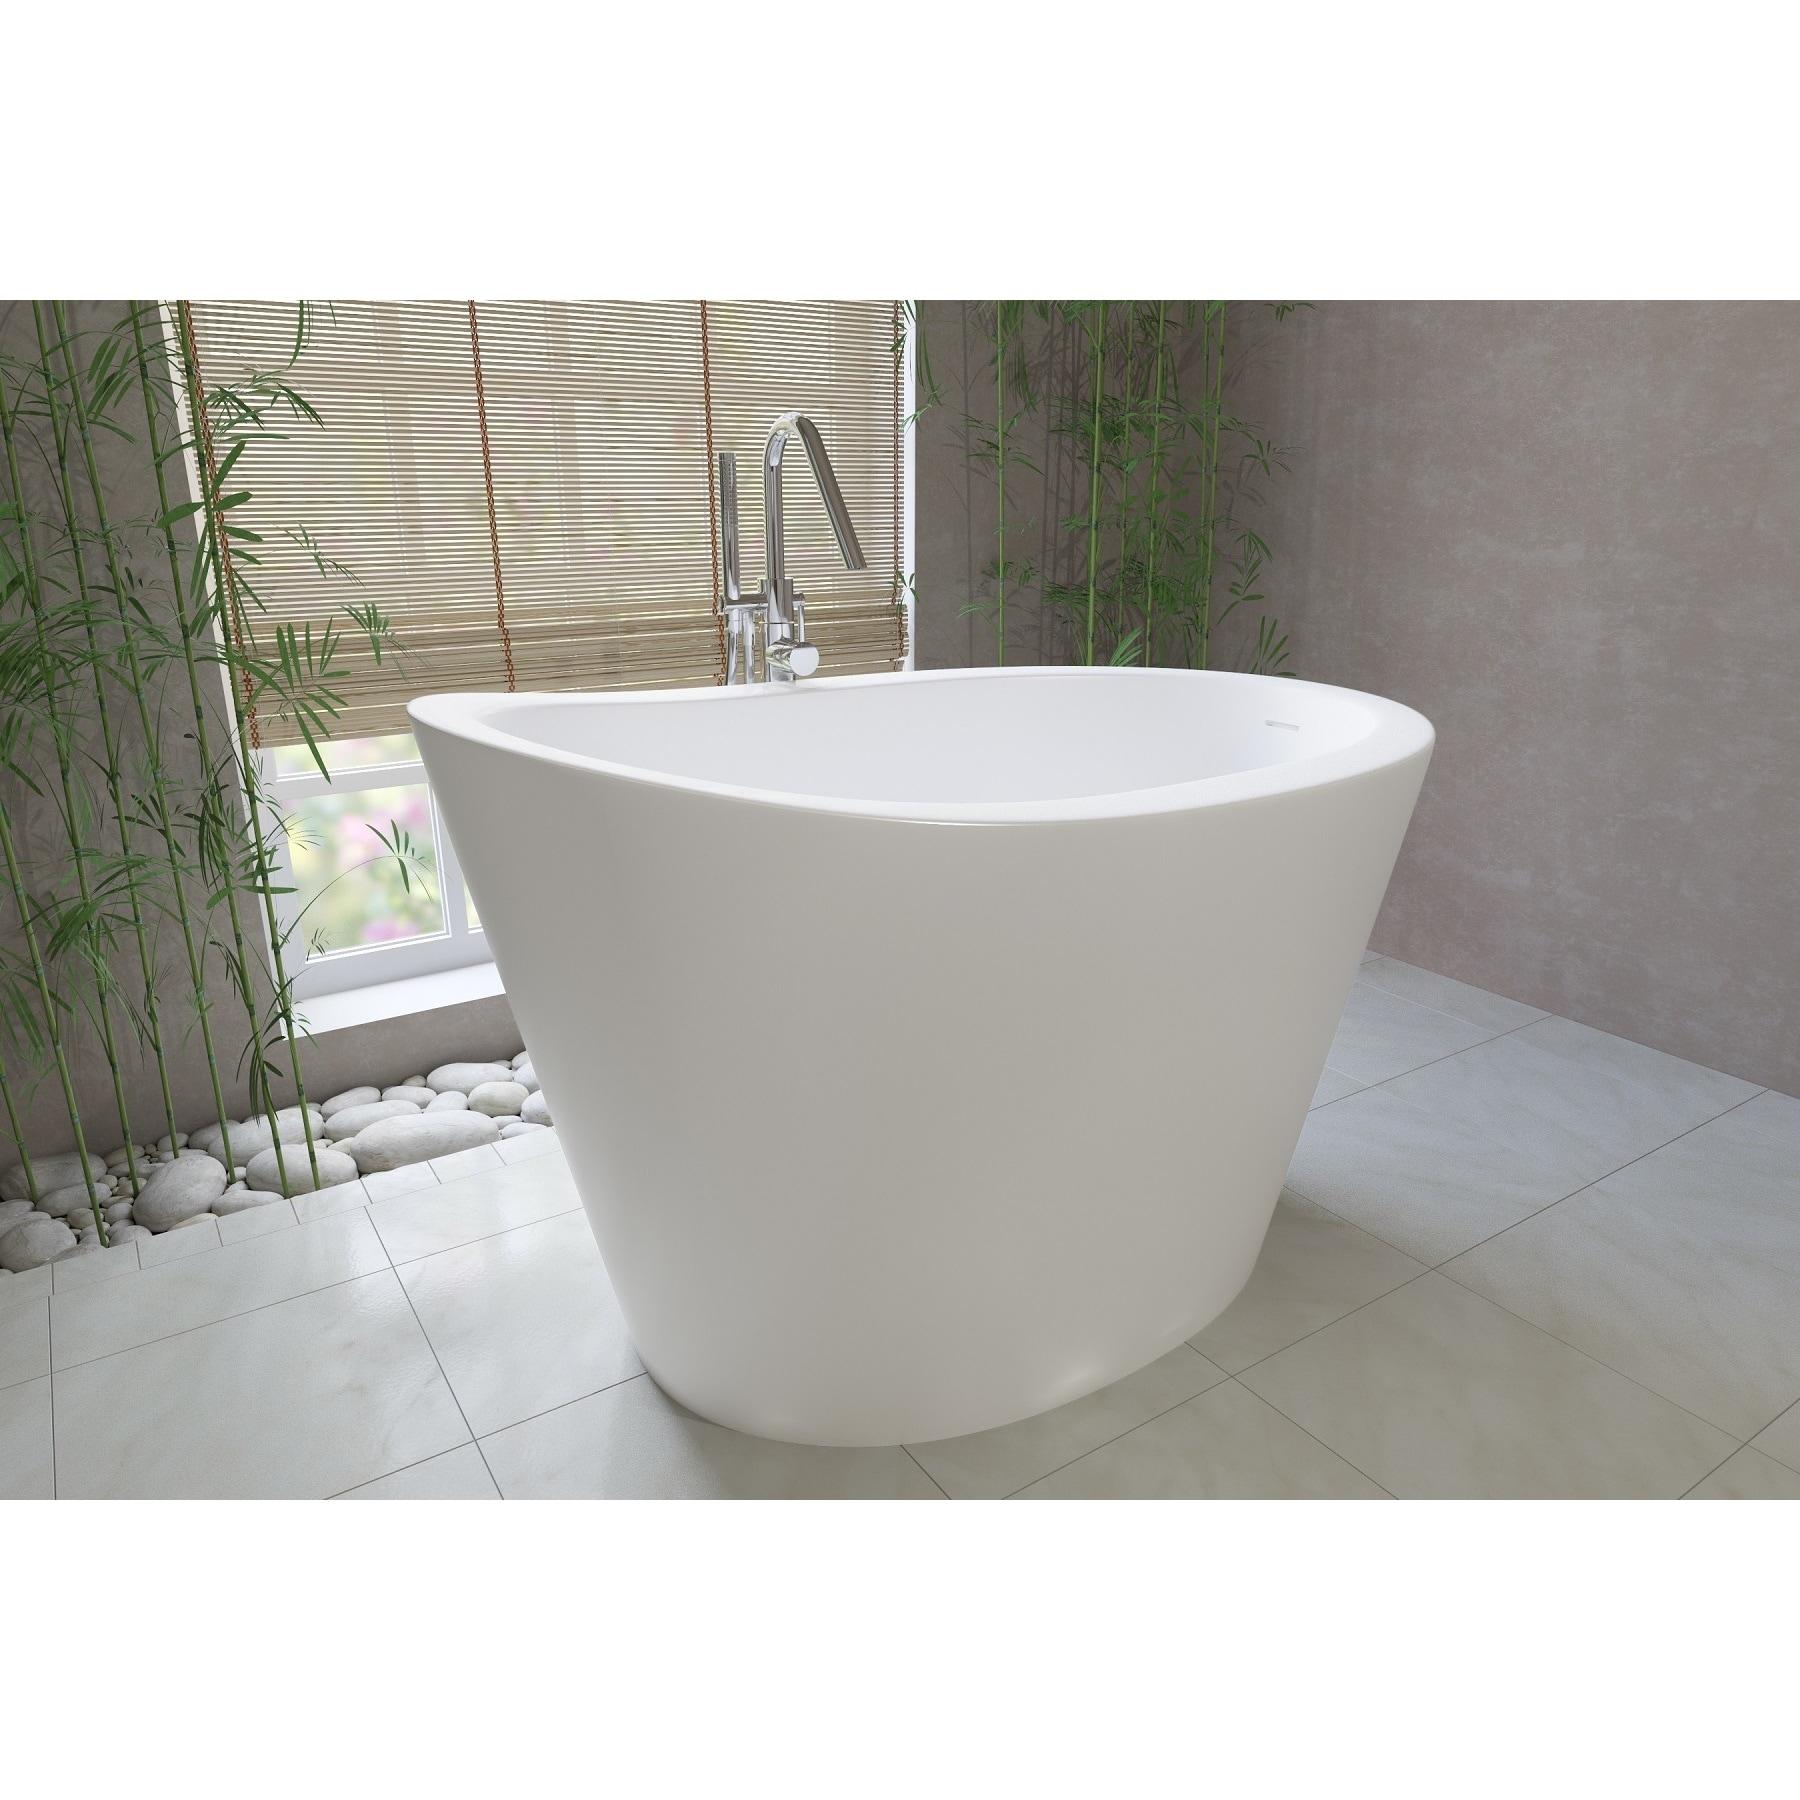 Shop Aquatica True Ofuro Freestanding Stone Japanese Soaking Bathtub ...